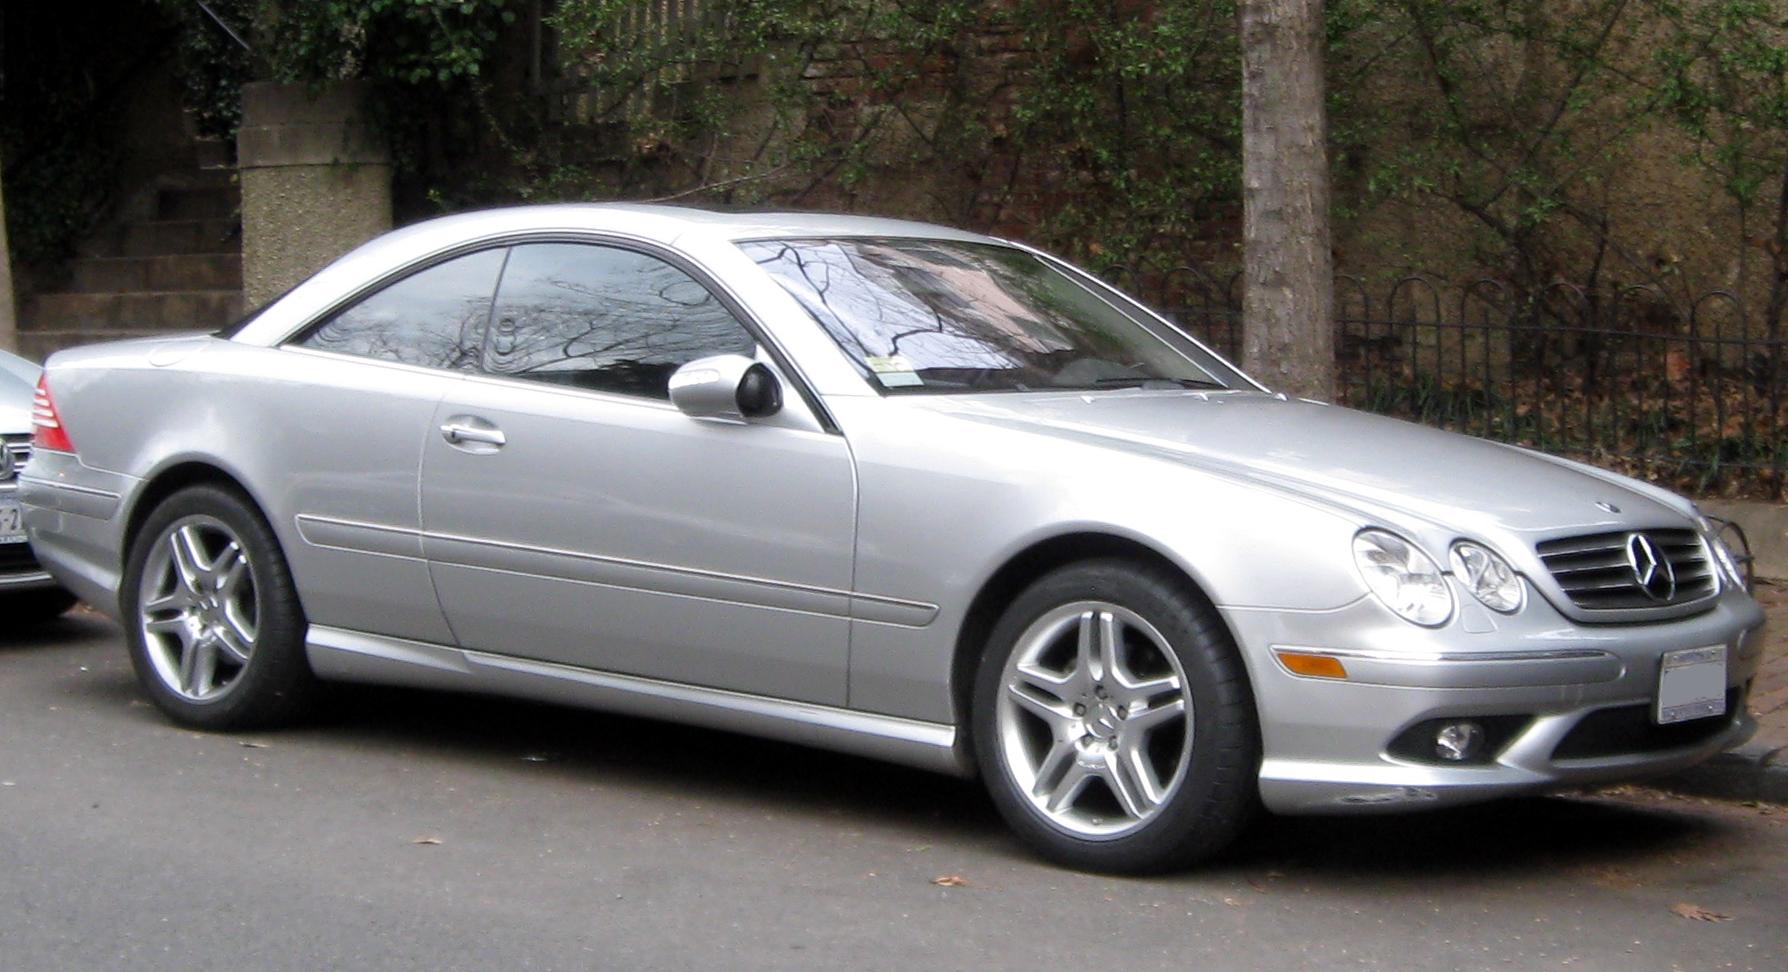 hight resolution of 2002 mercede s500 white